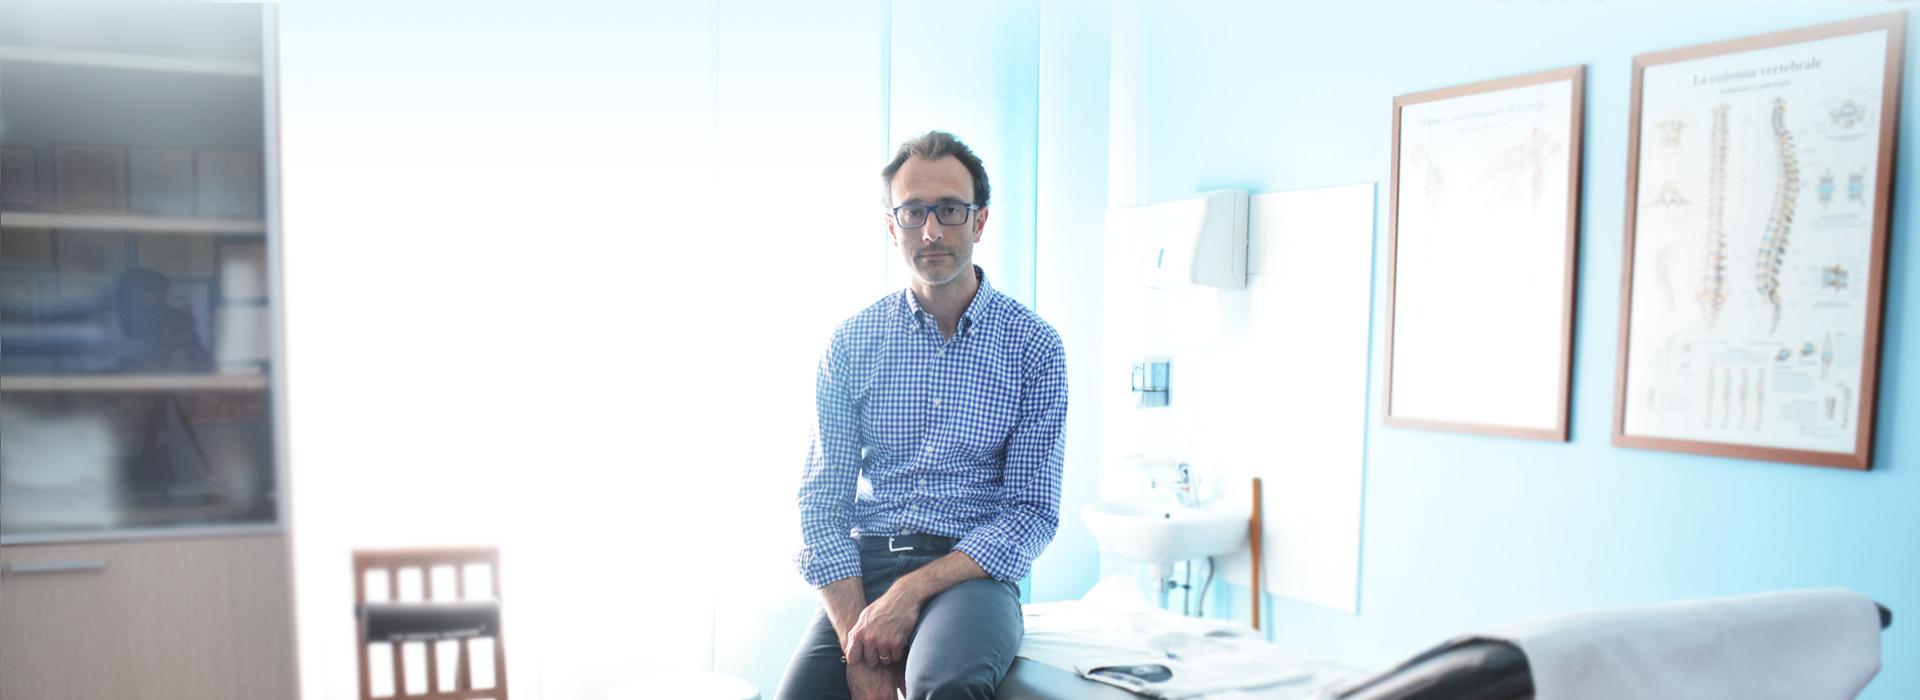 Paolo Bartek